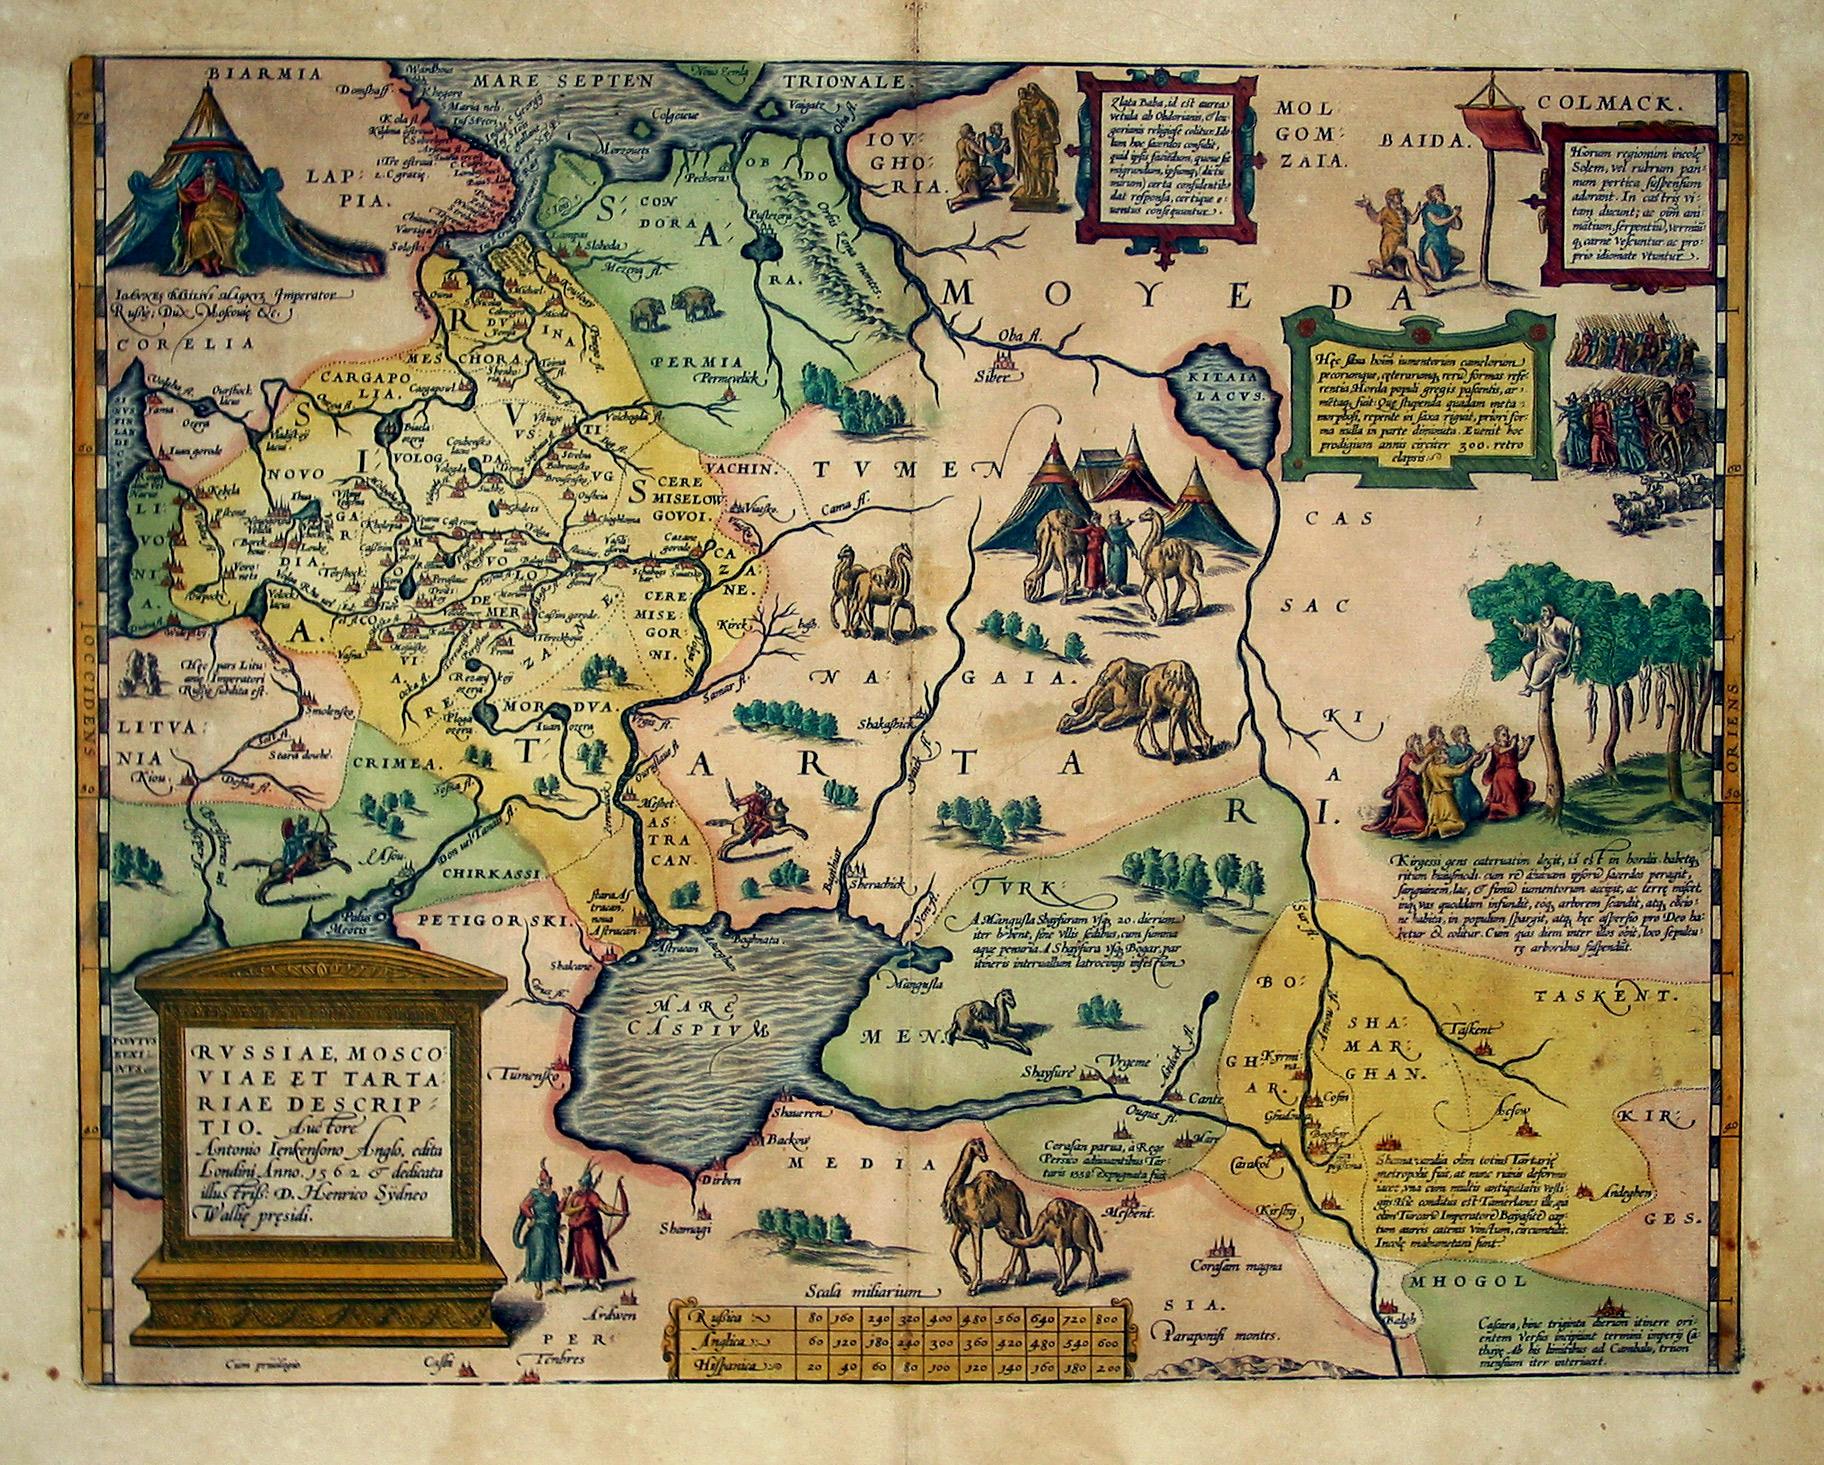 https://upload.wikimedia.org/wikipedia/en/d/d7/Map_Russiae%2C_Moscoviae_et_Tartariae_1562_Ortelius.jpg